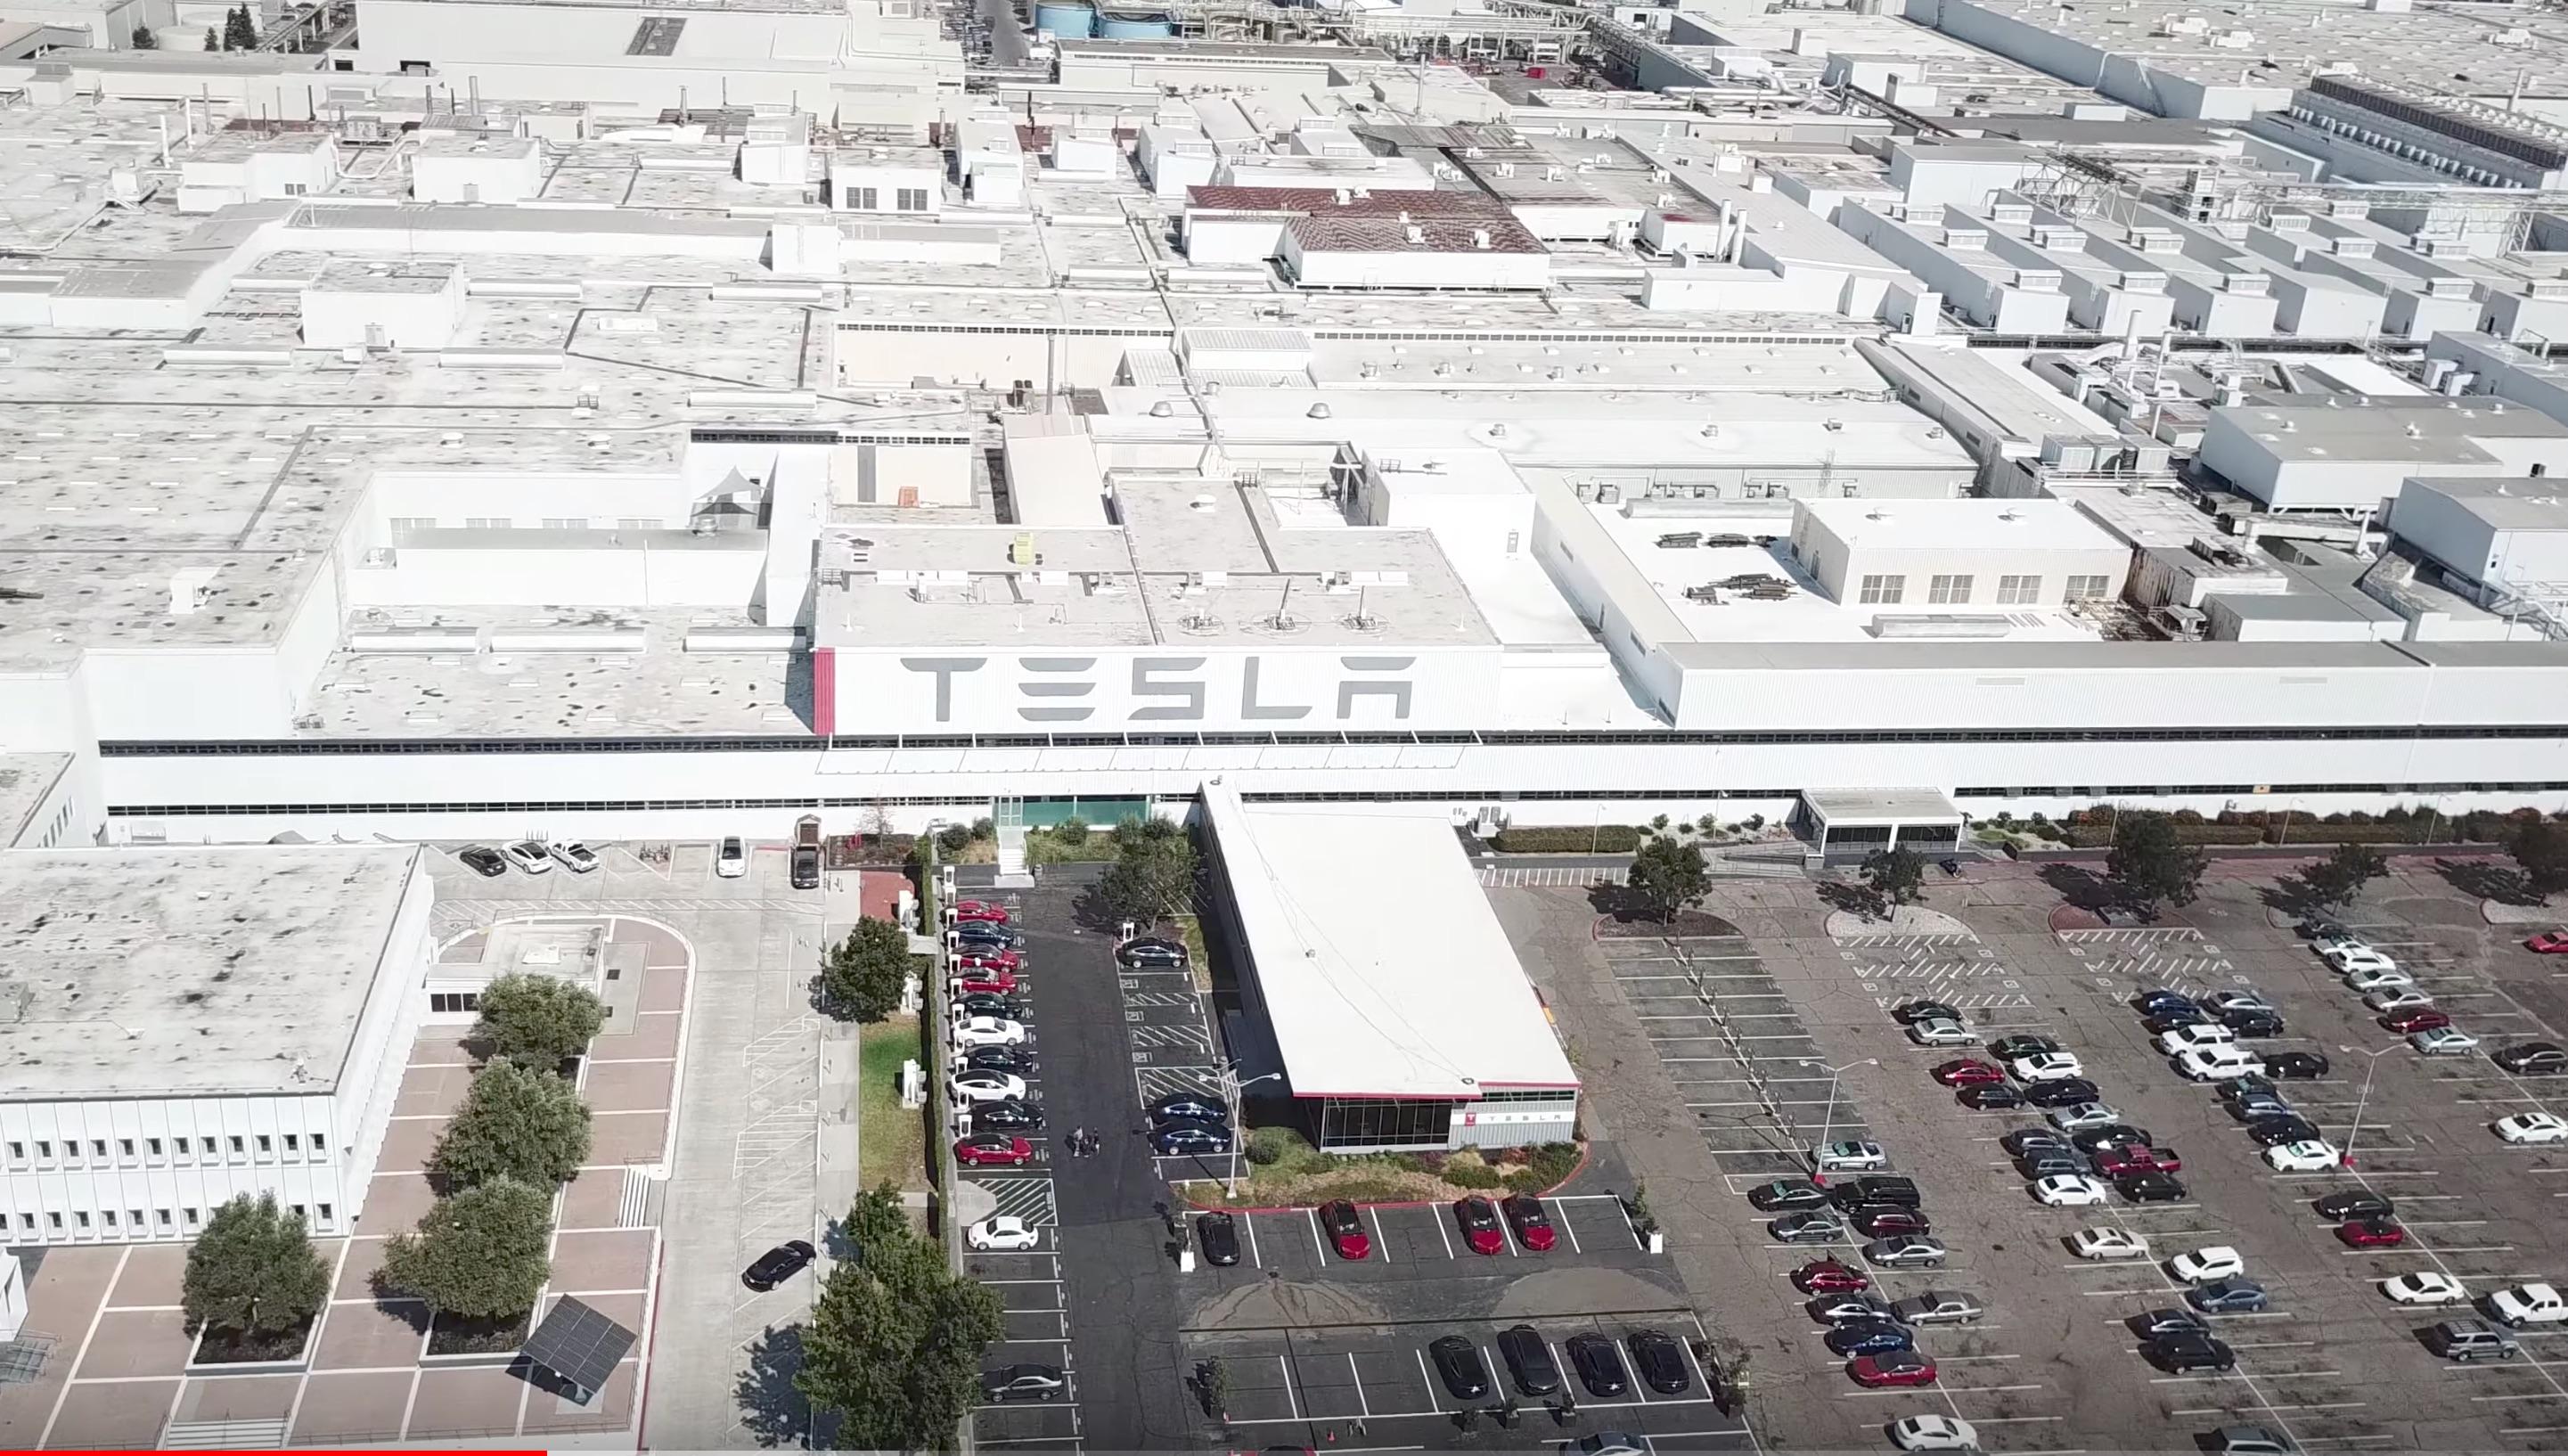 tesla-fremont-factory-drone-sep-2017-3